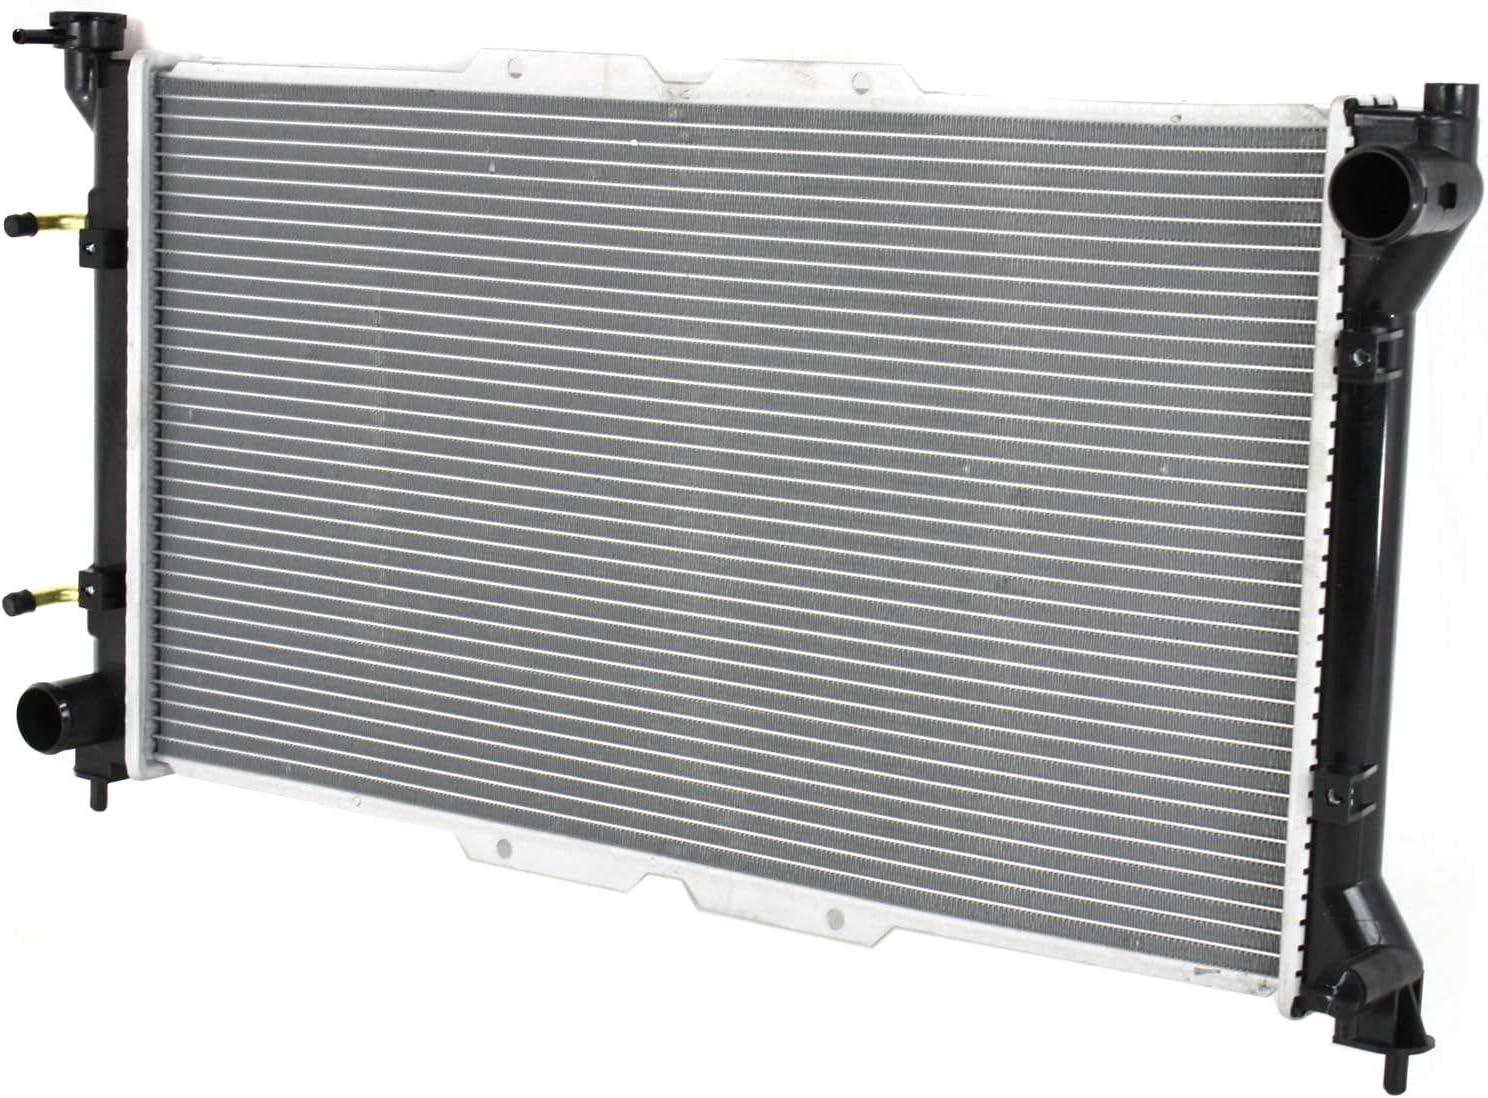 Radiator Spectra CU1853 fits 95-99 Subaru Legacy